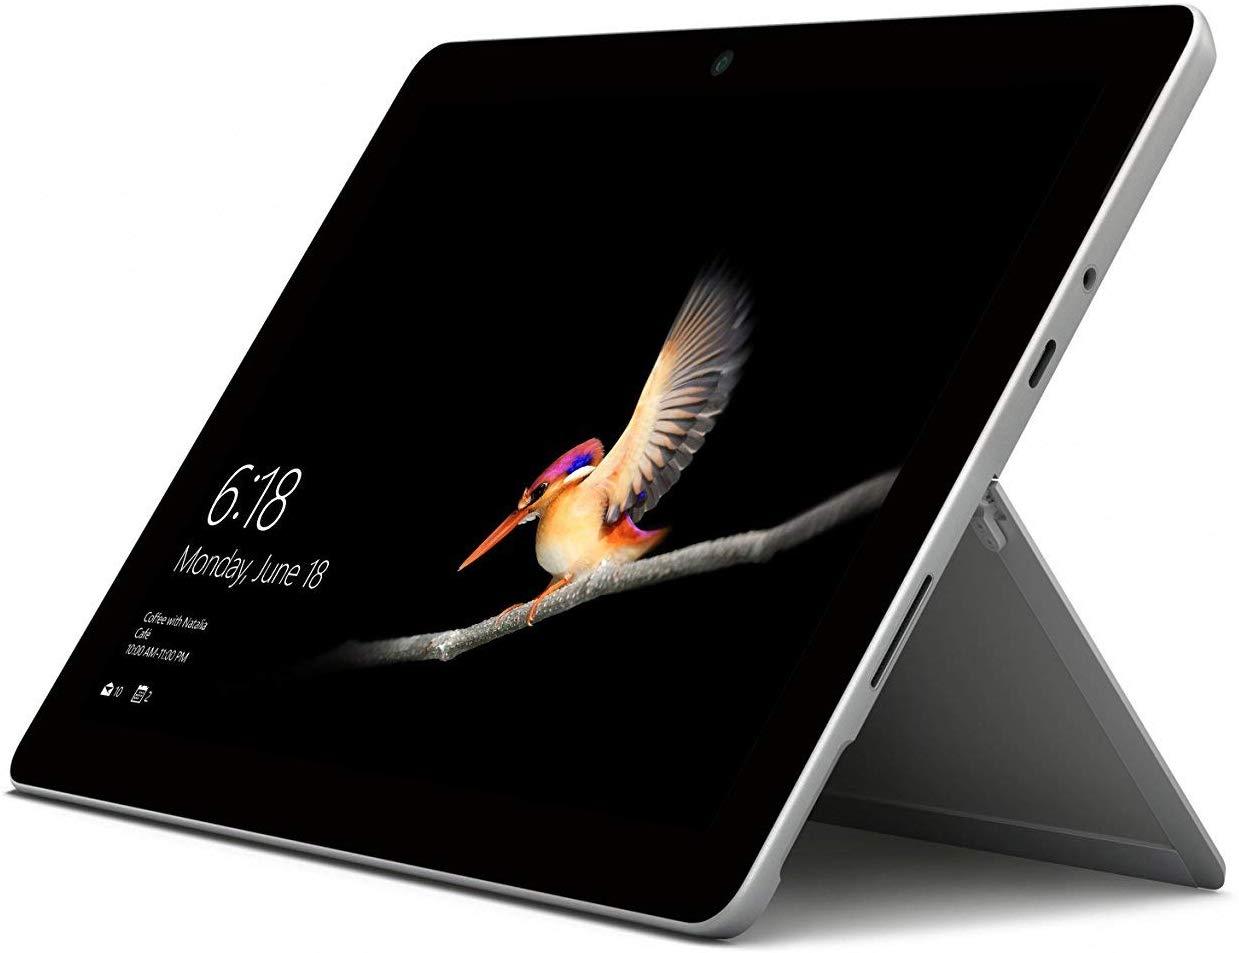 Microsoft Surface GO 10-Inch Tablet-PC - (Silver) (Intel Pentium 4415Y Gold Processor - Mini Laptops